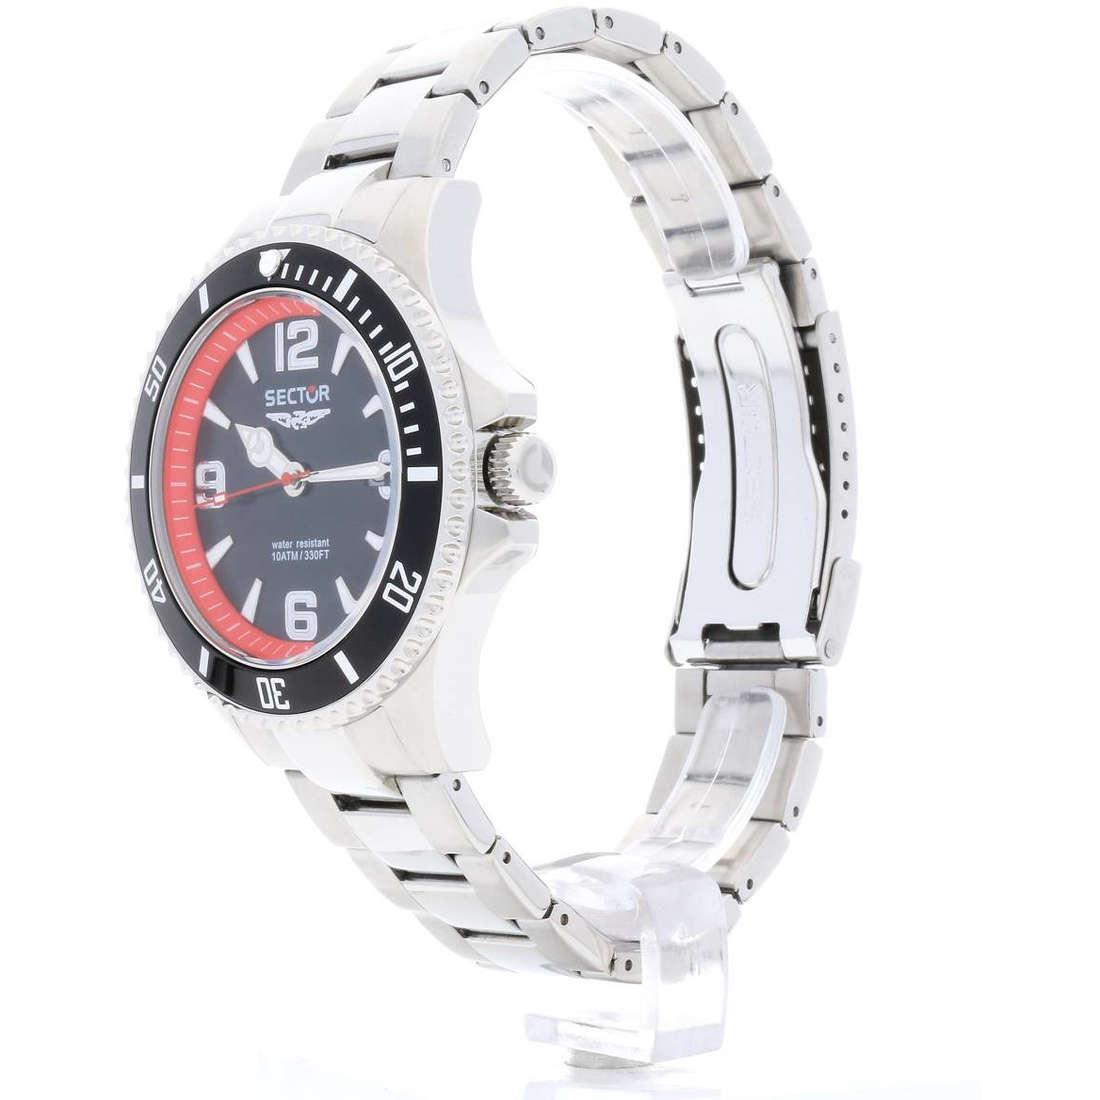 vendita orologi uomo Sector R3253161002